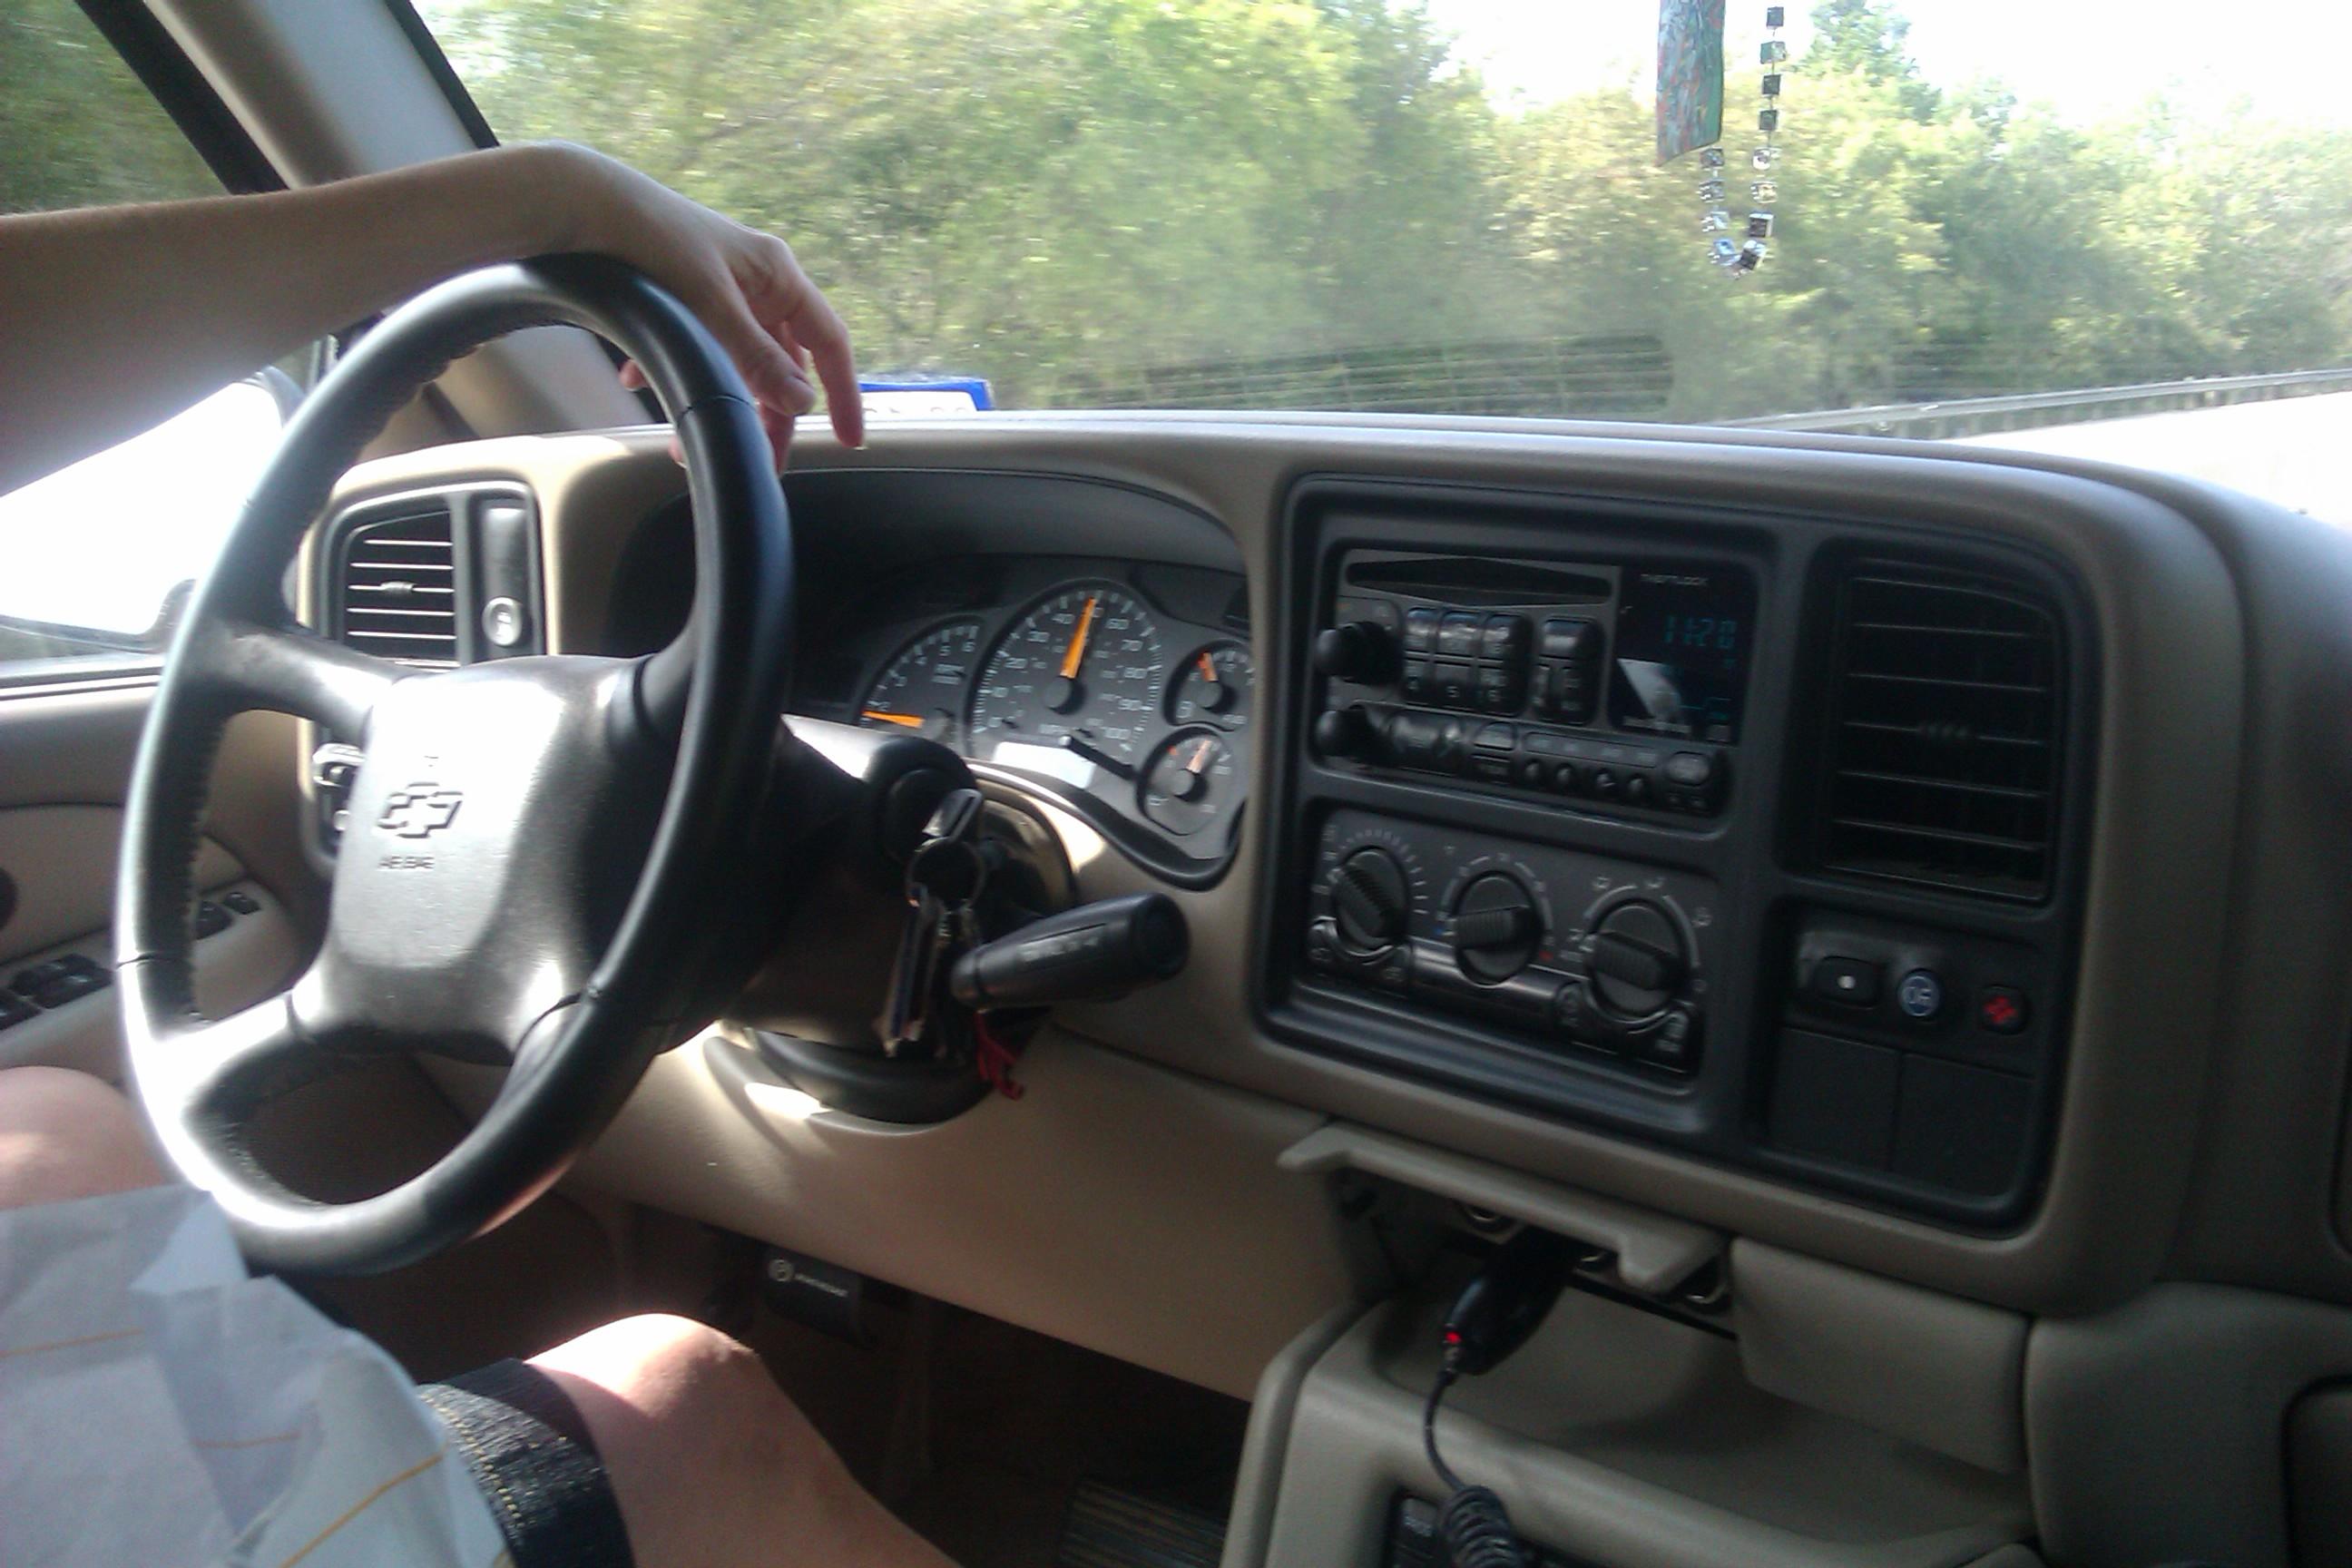 ... 2002 Chevrolet Suburban LT [Interior] [1] By TR0LLHAMMEREN